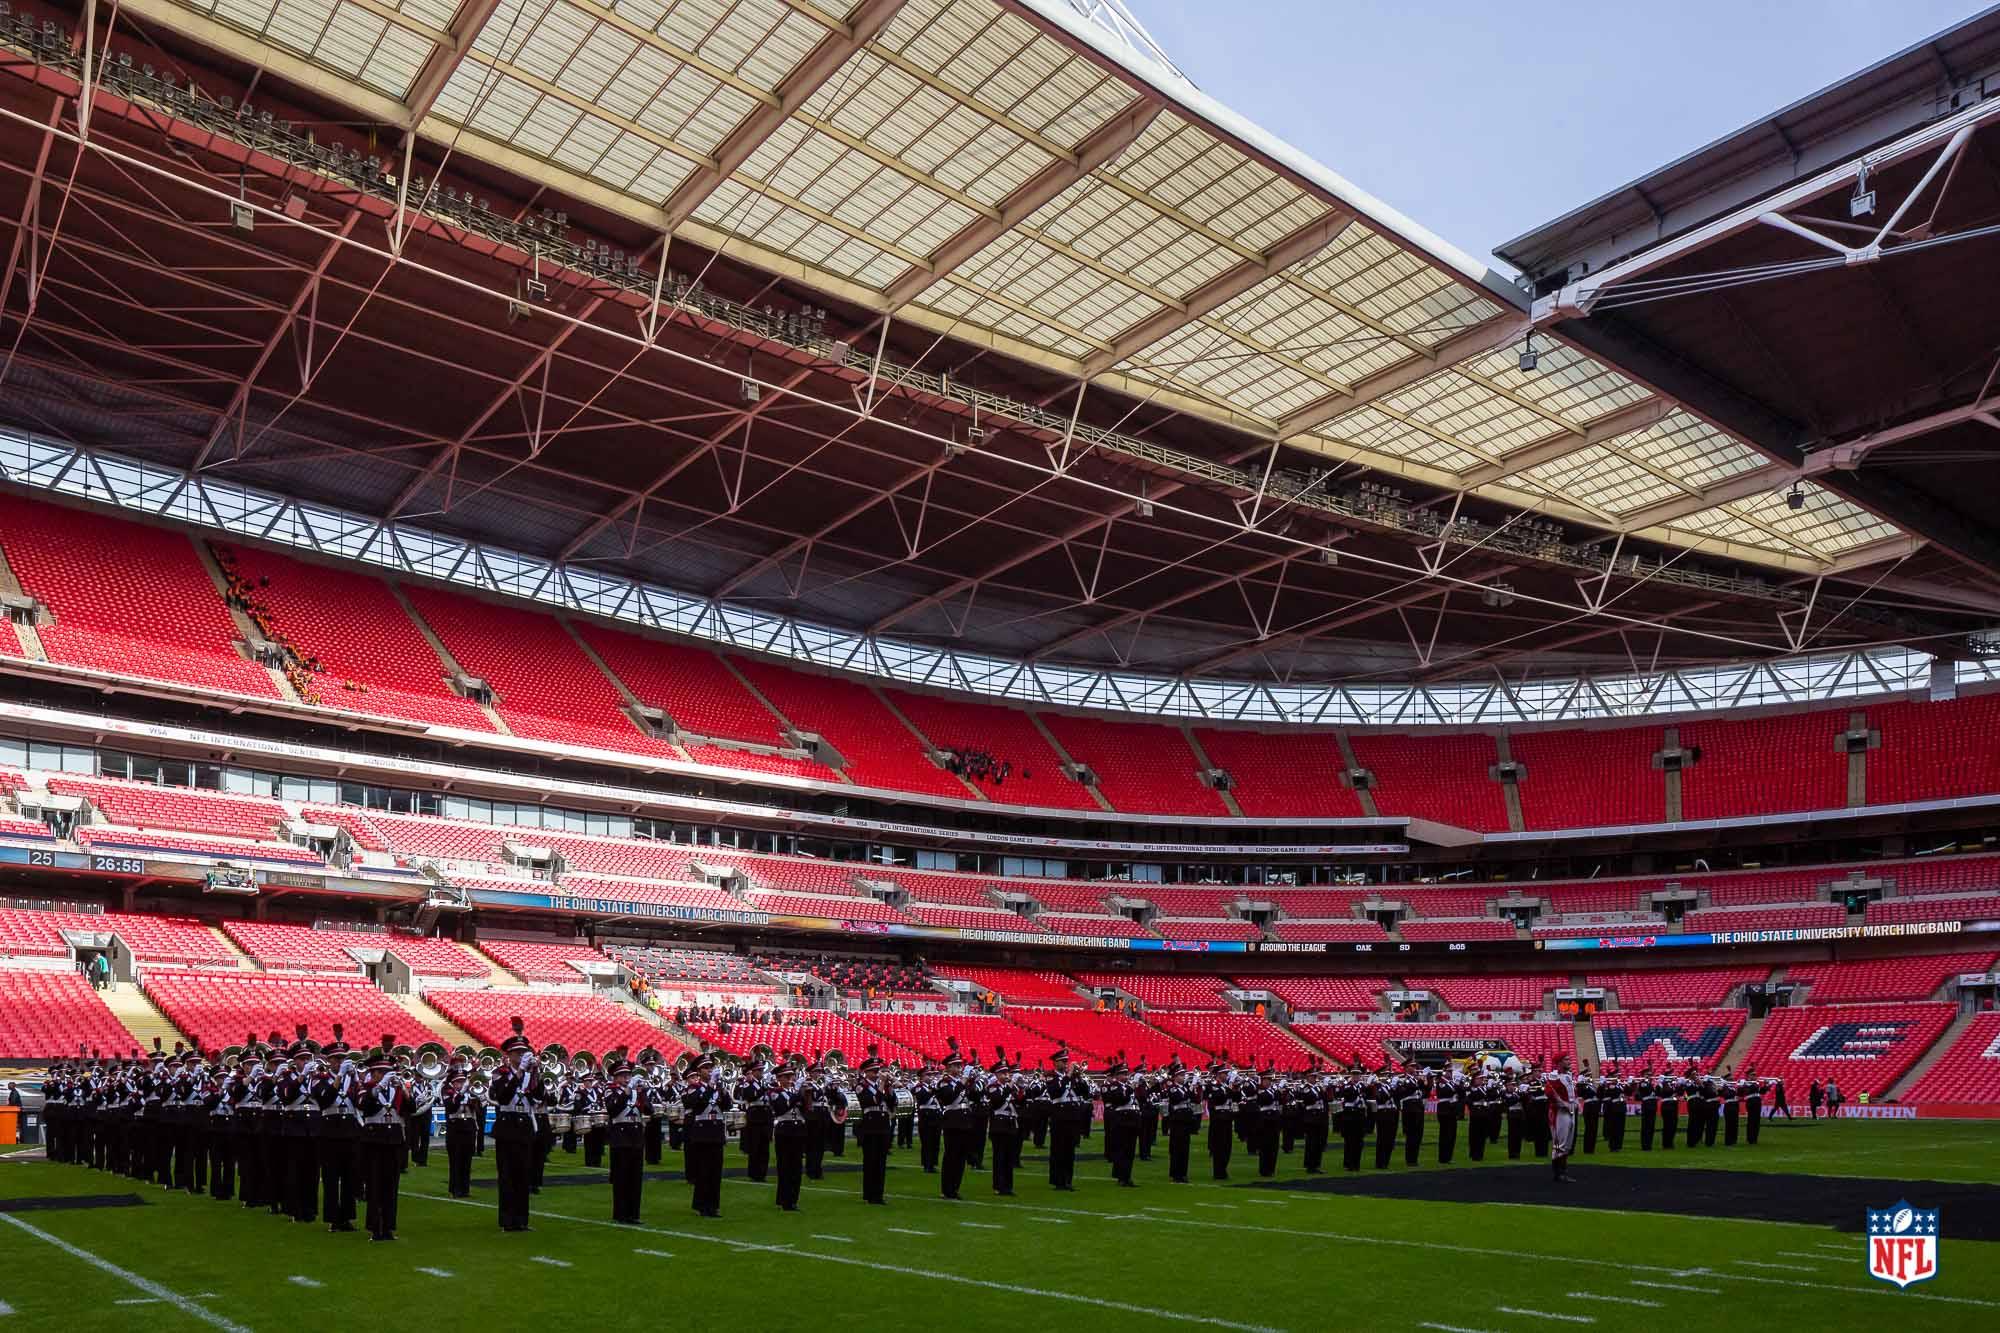 008_151025_London_Wembley_Game13_Decor_043010.jpg